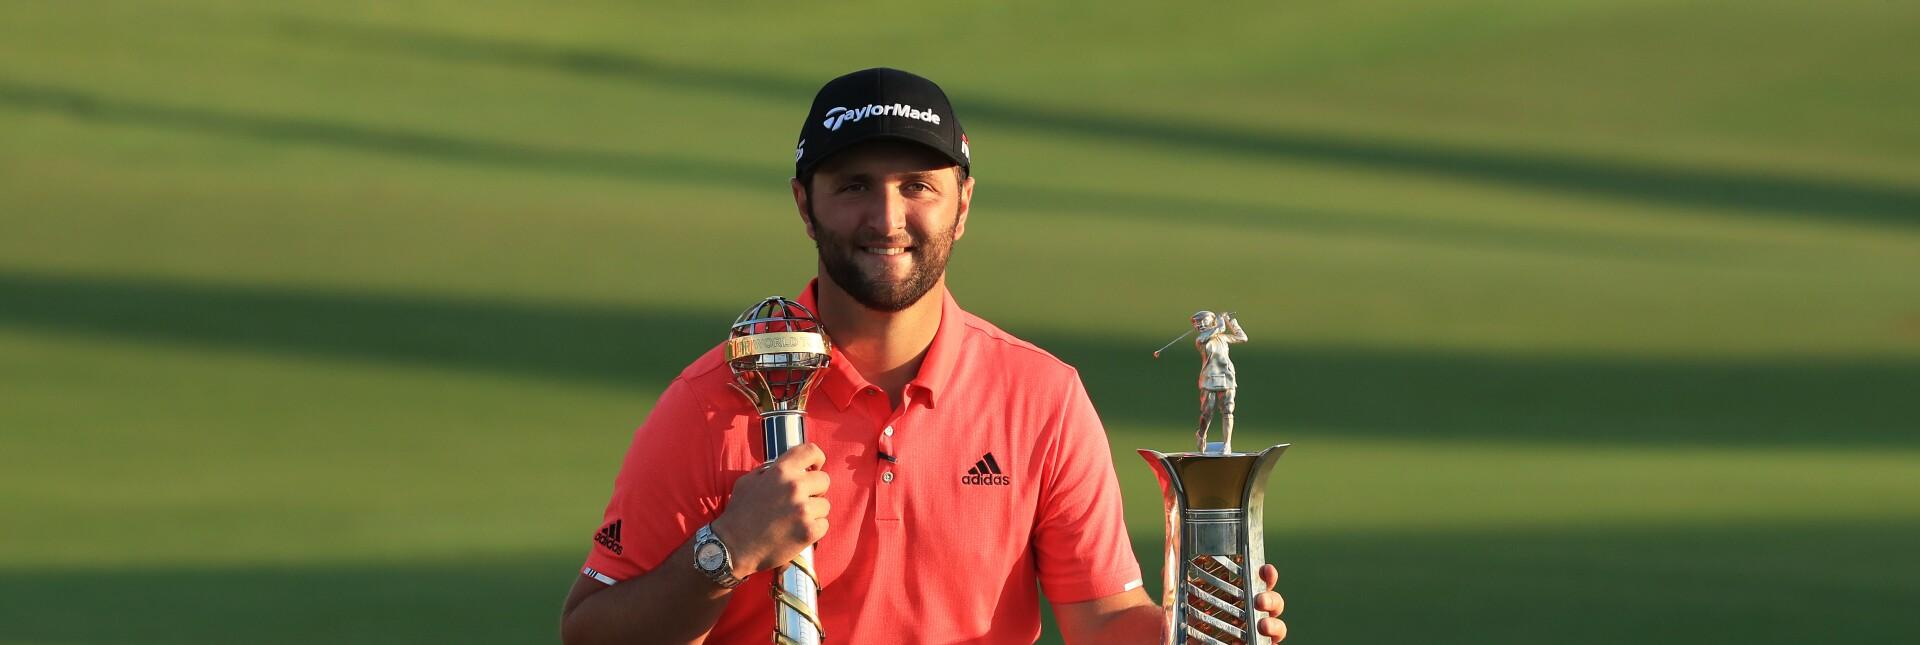 Jon Rahm after triumphing twice in Dubai